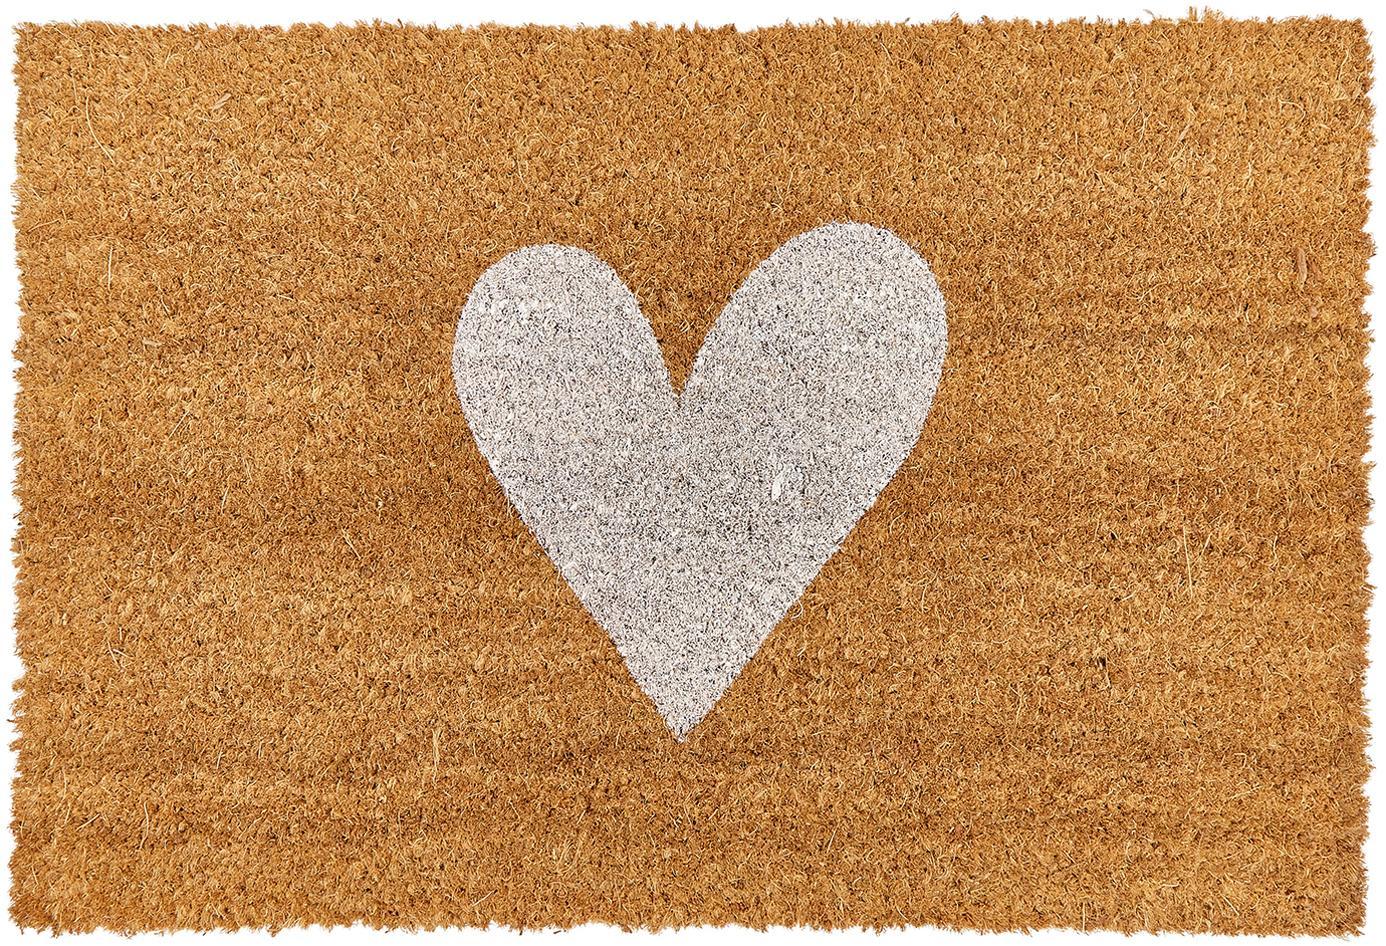 Fussmatte Love, Flor: Kokosfaser, Flor: Beige, Weiss Rücken: Schwarz, 40 x 60 cm